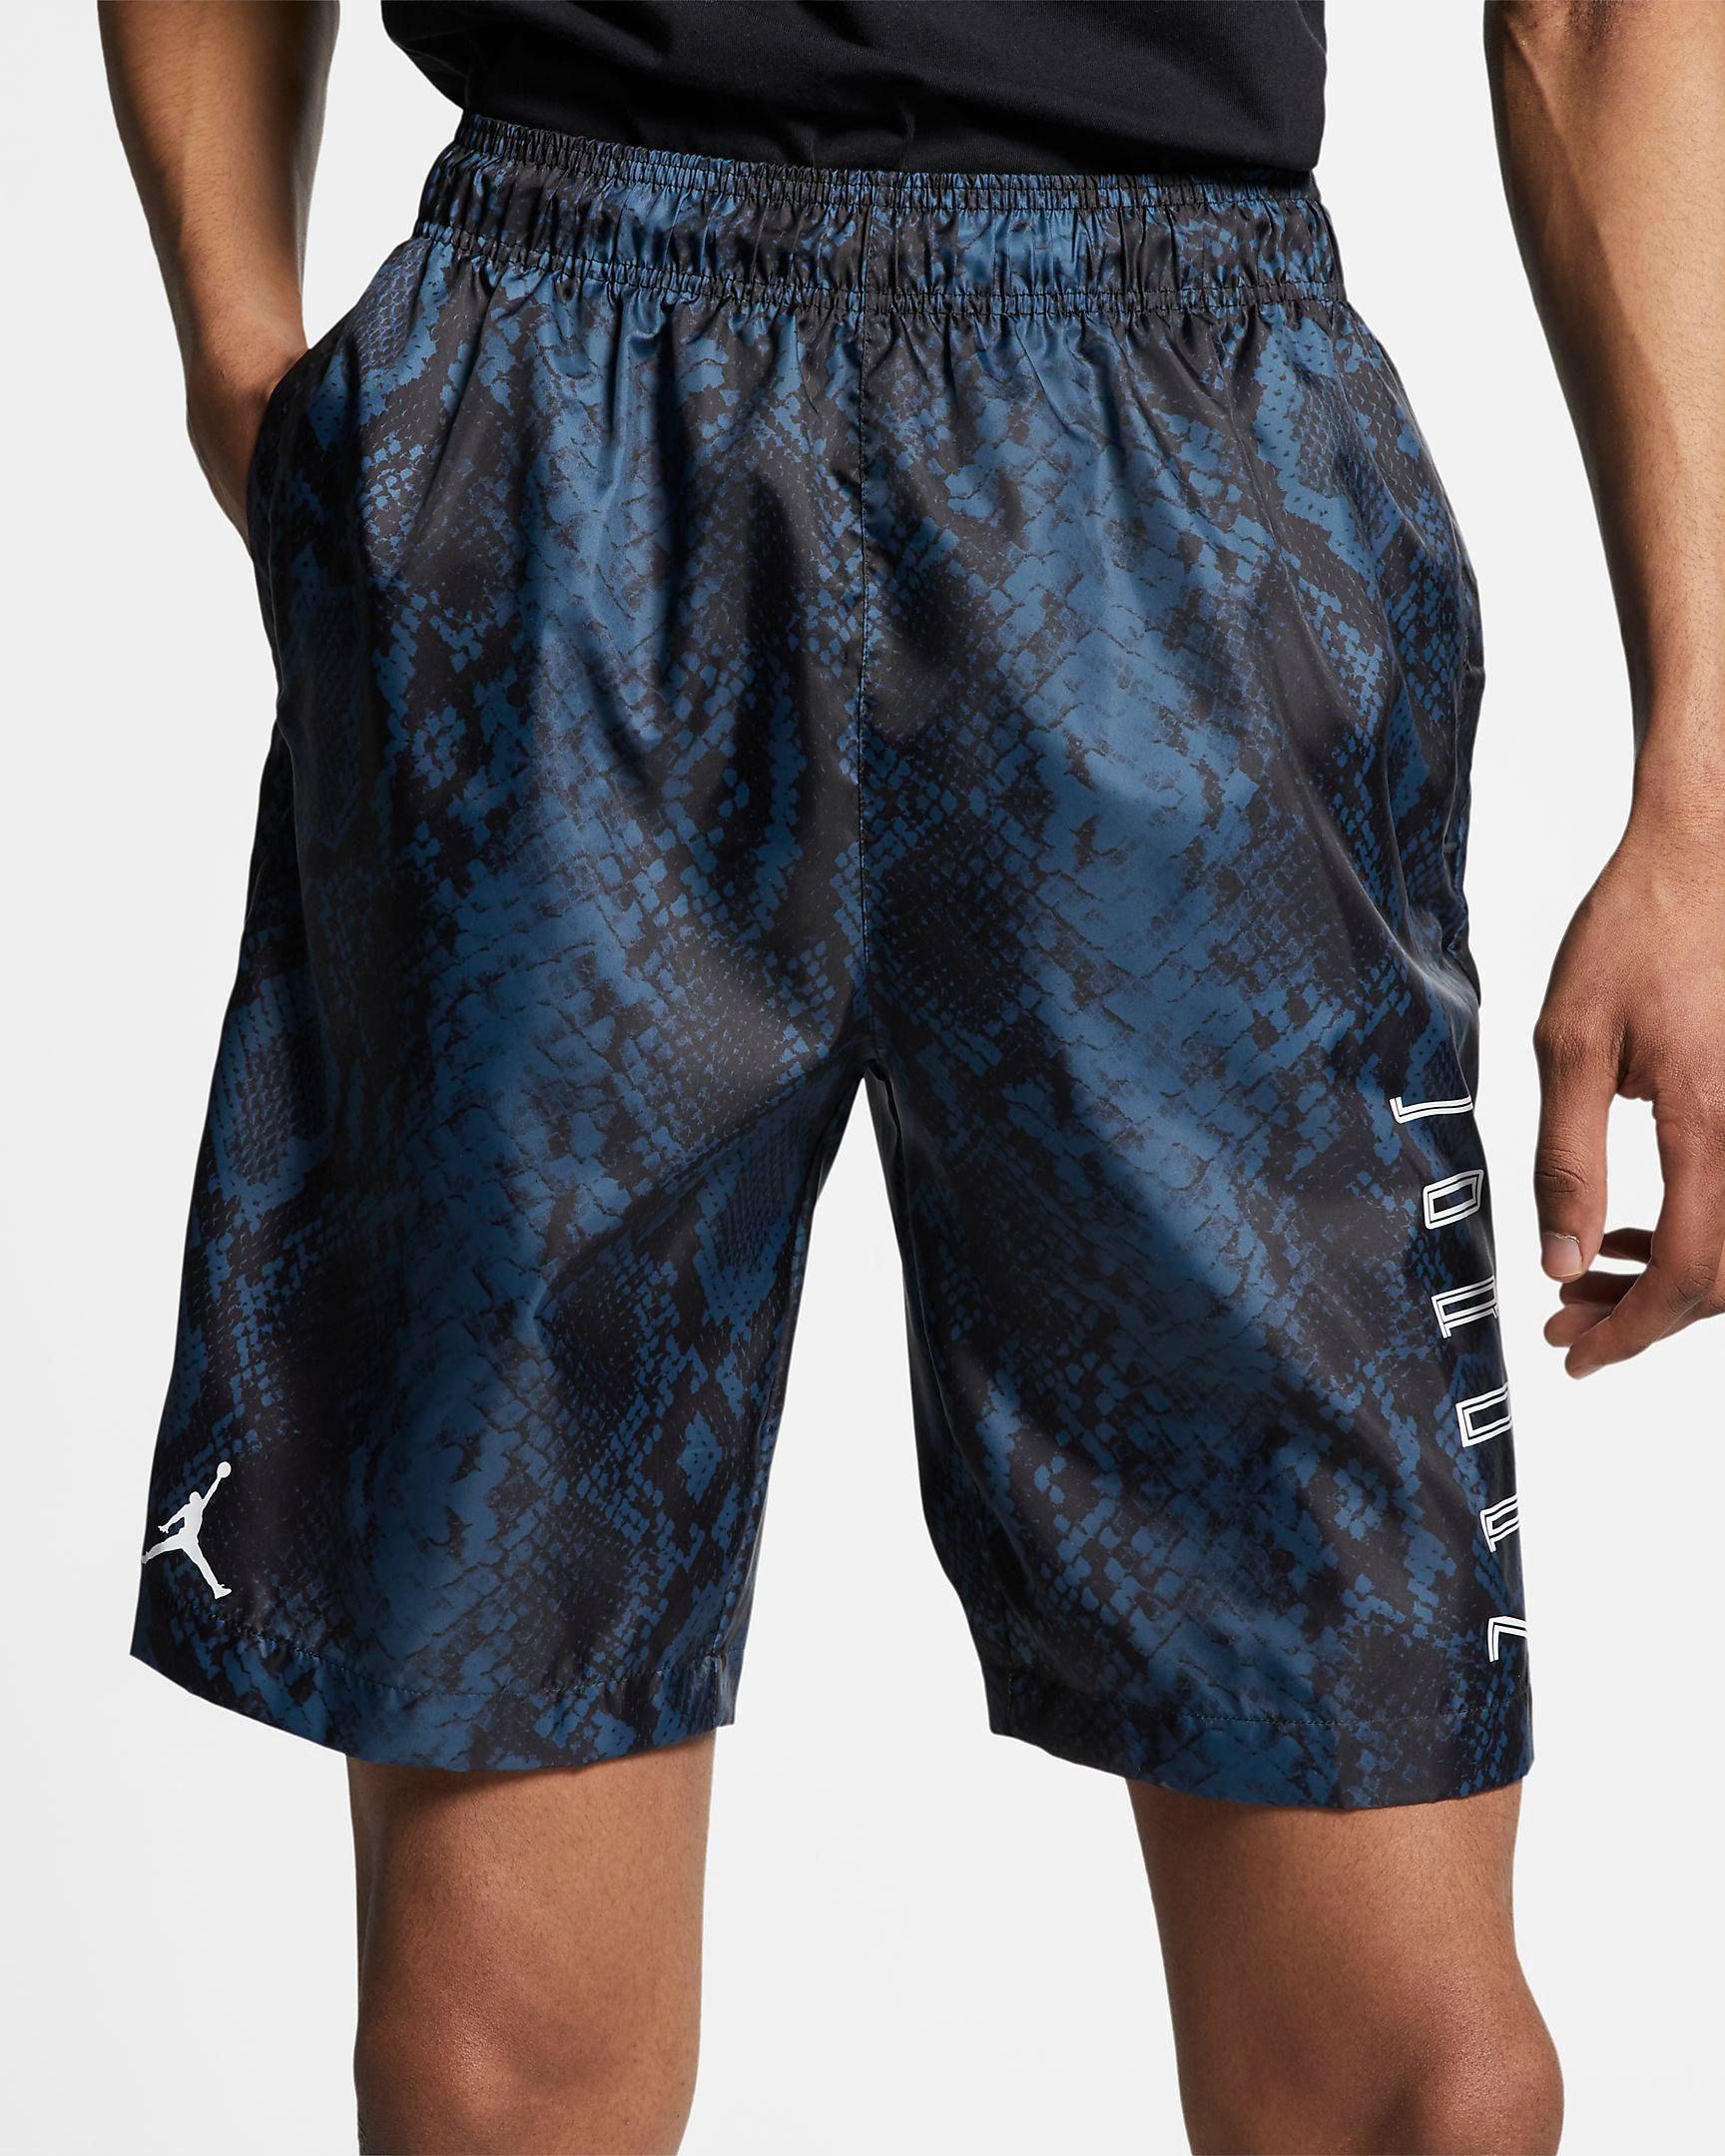 air-jordan-11-low-snakeskin-navy-blue-shorts-1